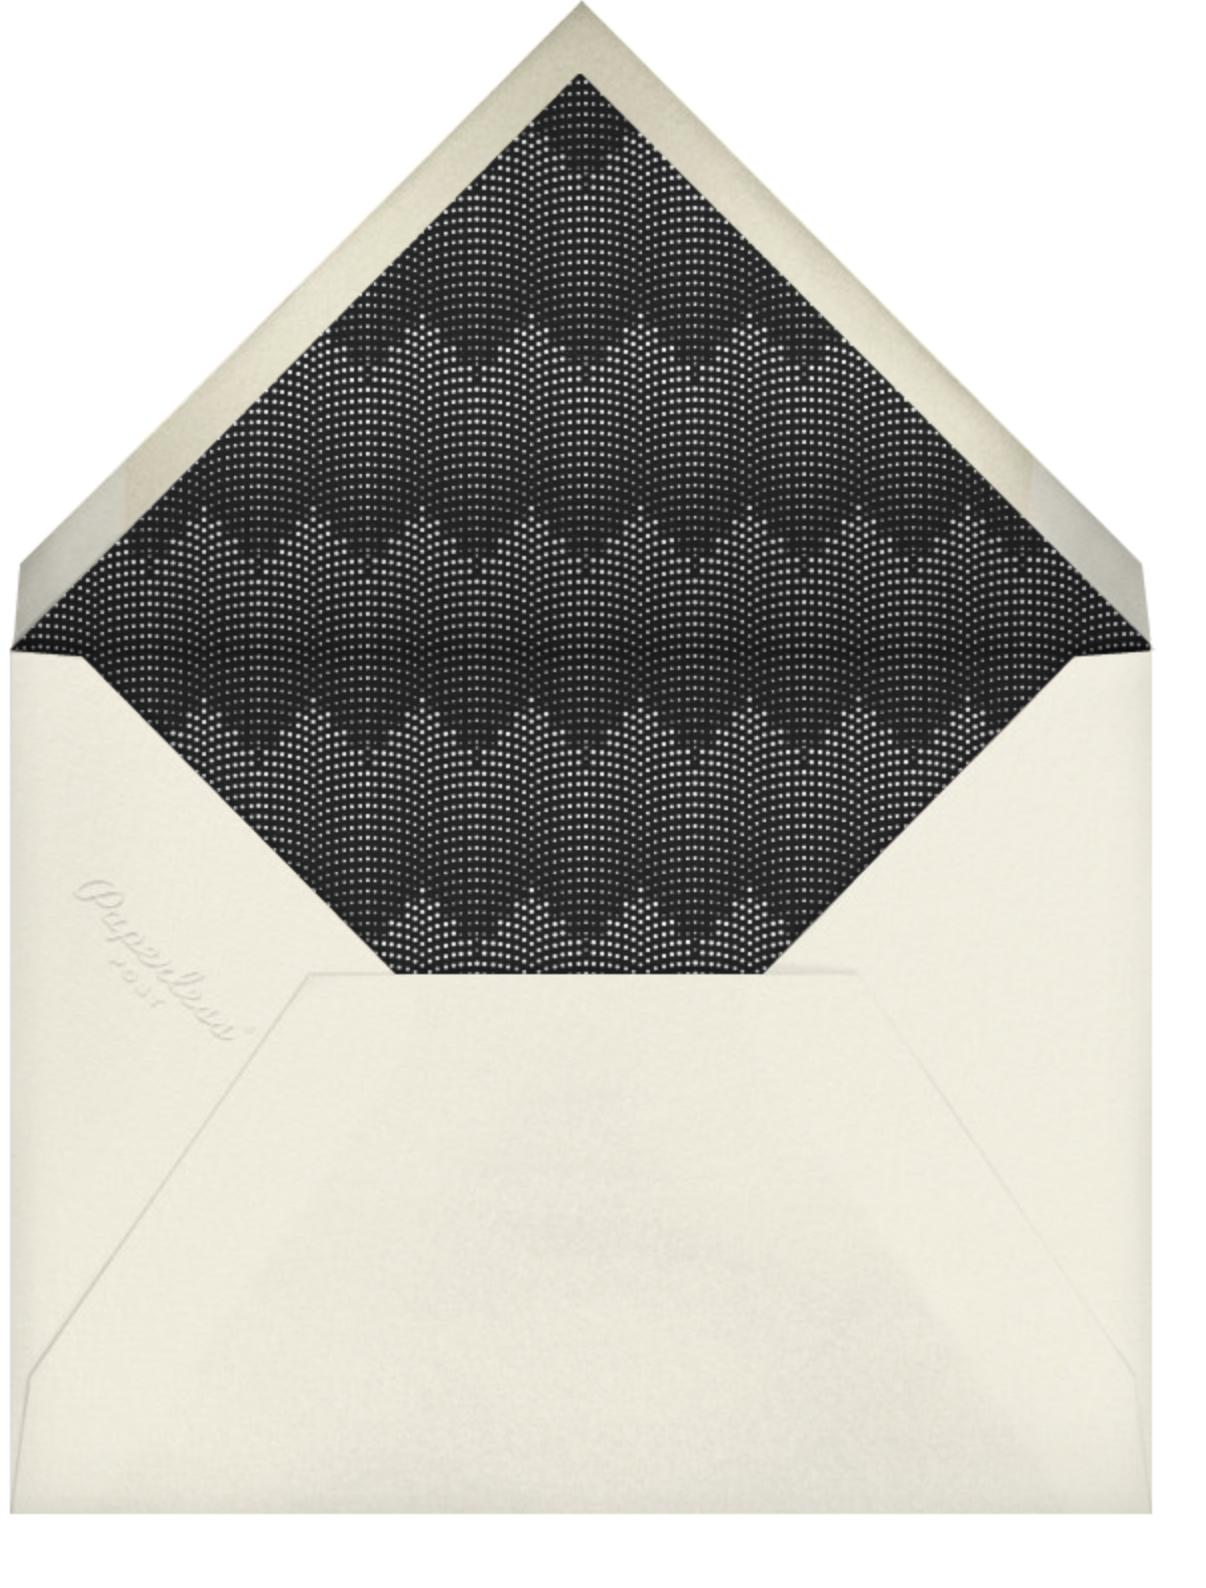 Rosina Photo - Black - Paperless Post - Designs we love - envelope back